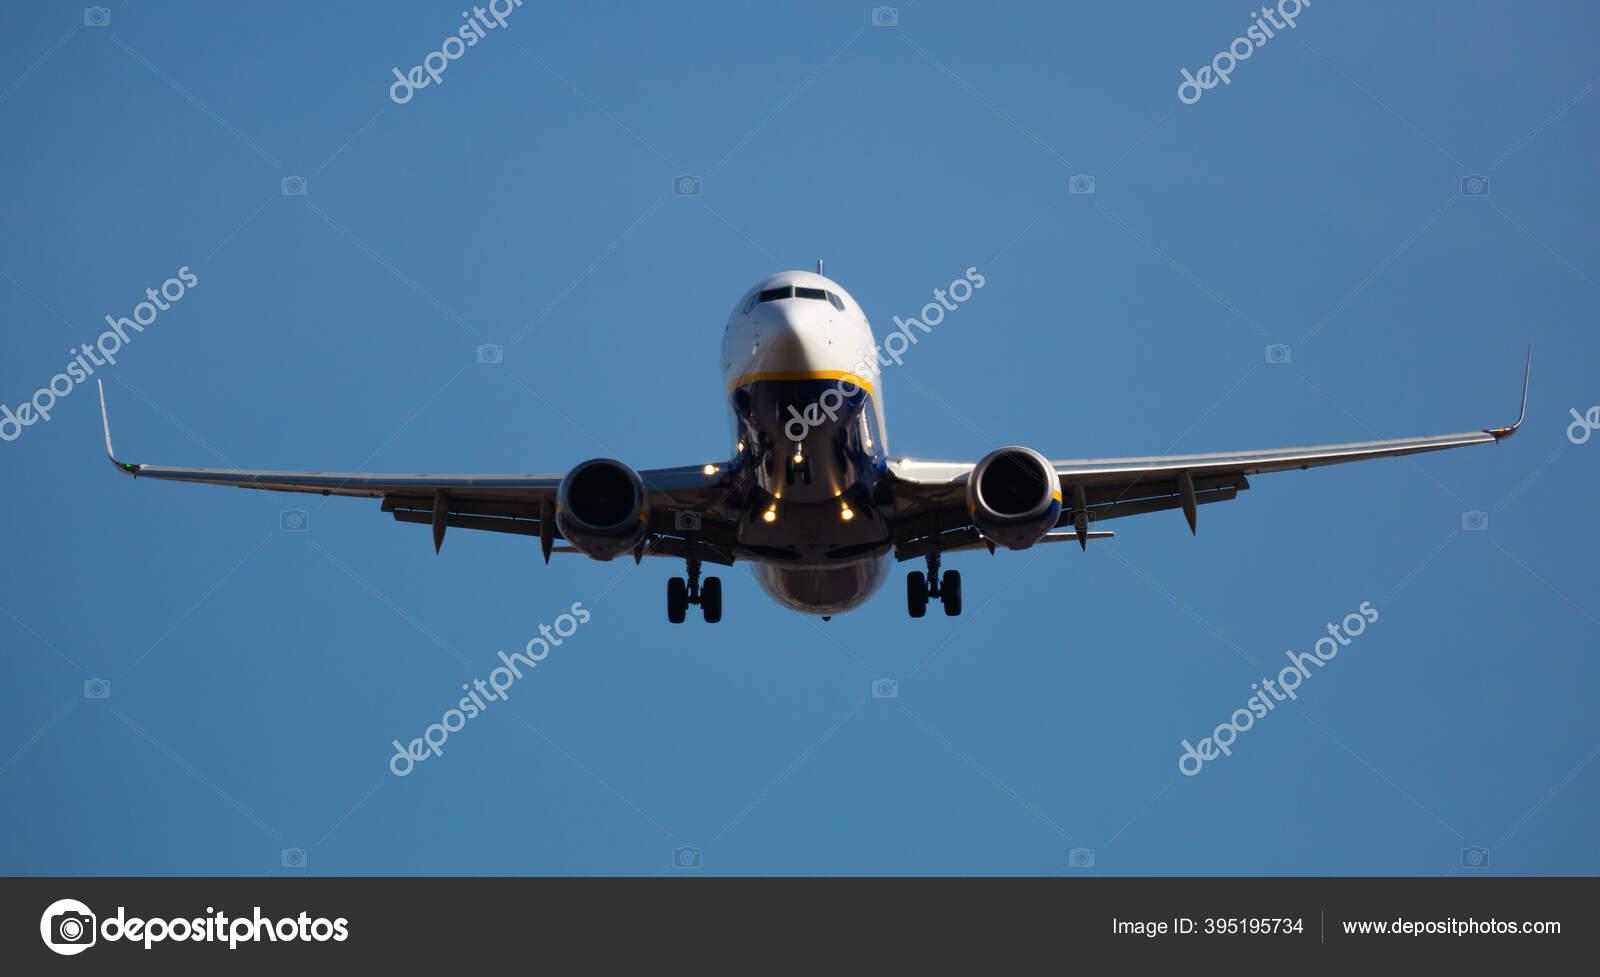 Обои ночь, Boeing 737, Самолёт, b737, tuifly, aircraft. Авиация foto 6